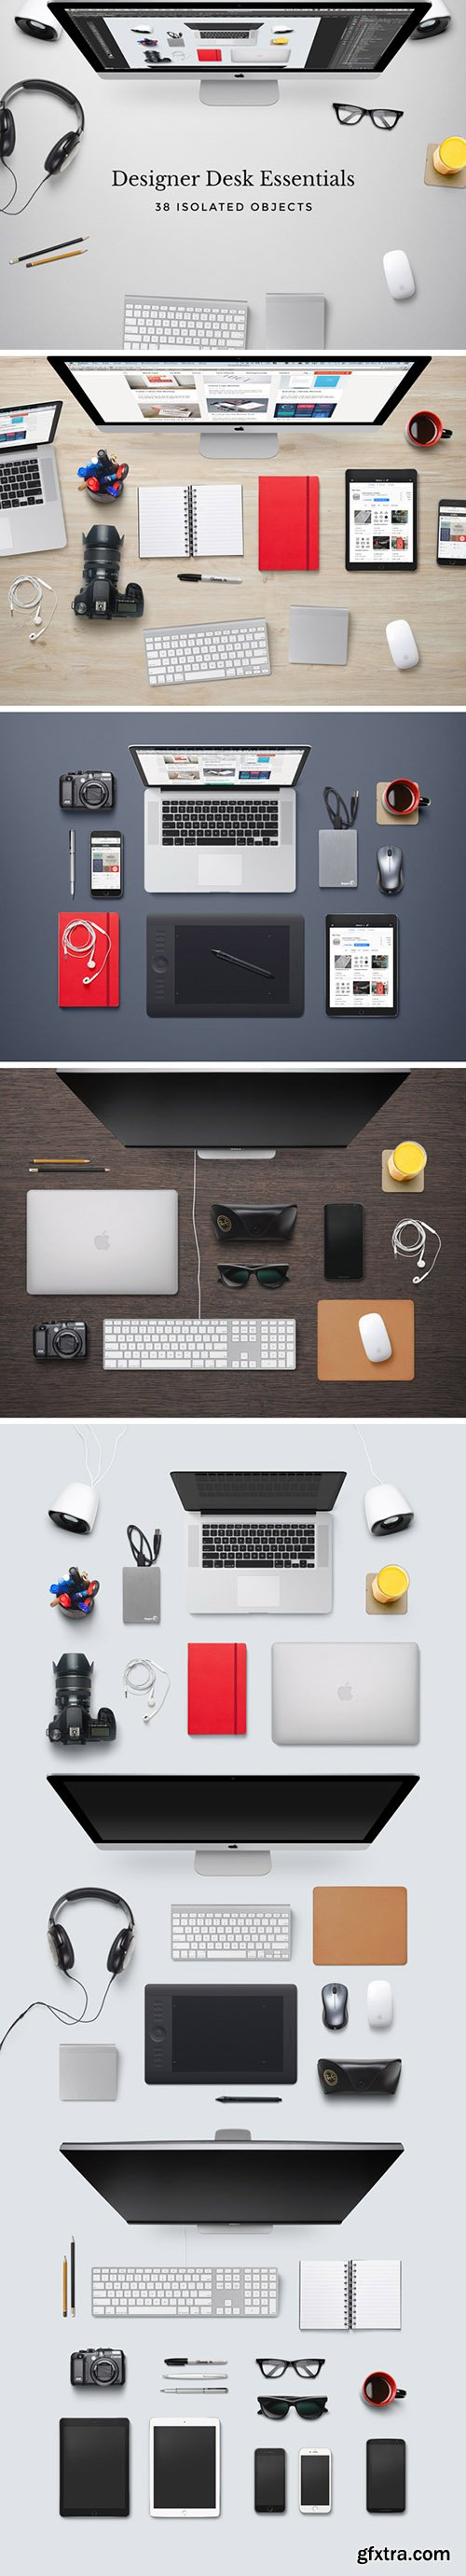 GraphicBurger - Designer Desk Essentials 5xPSD